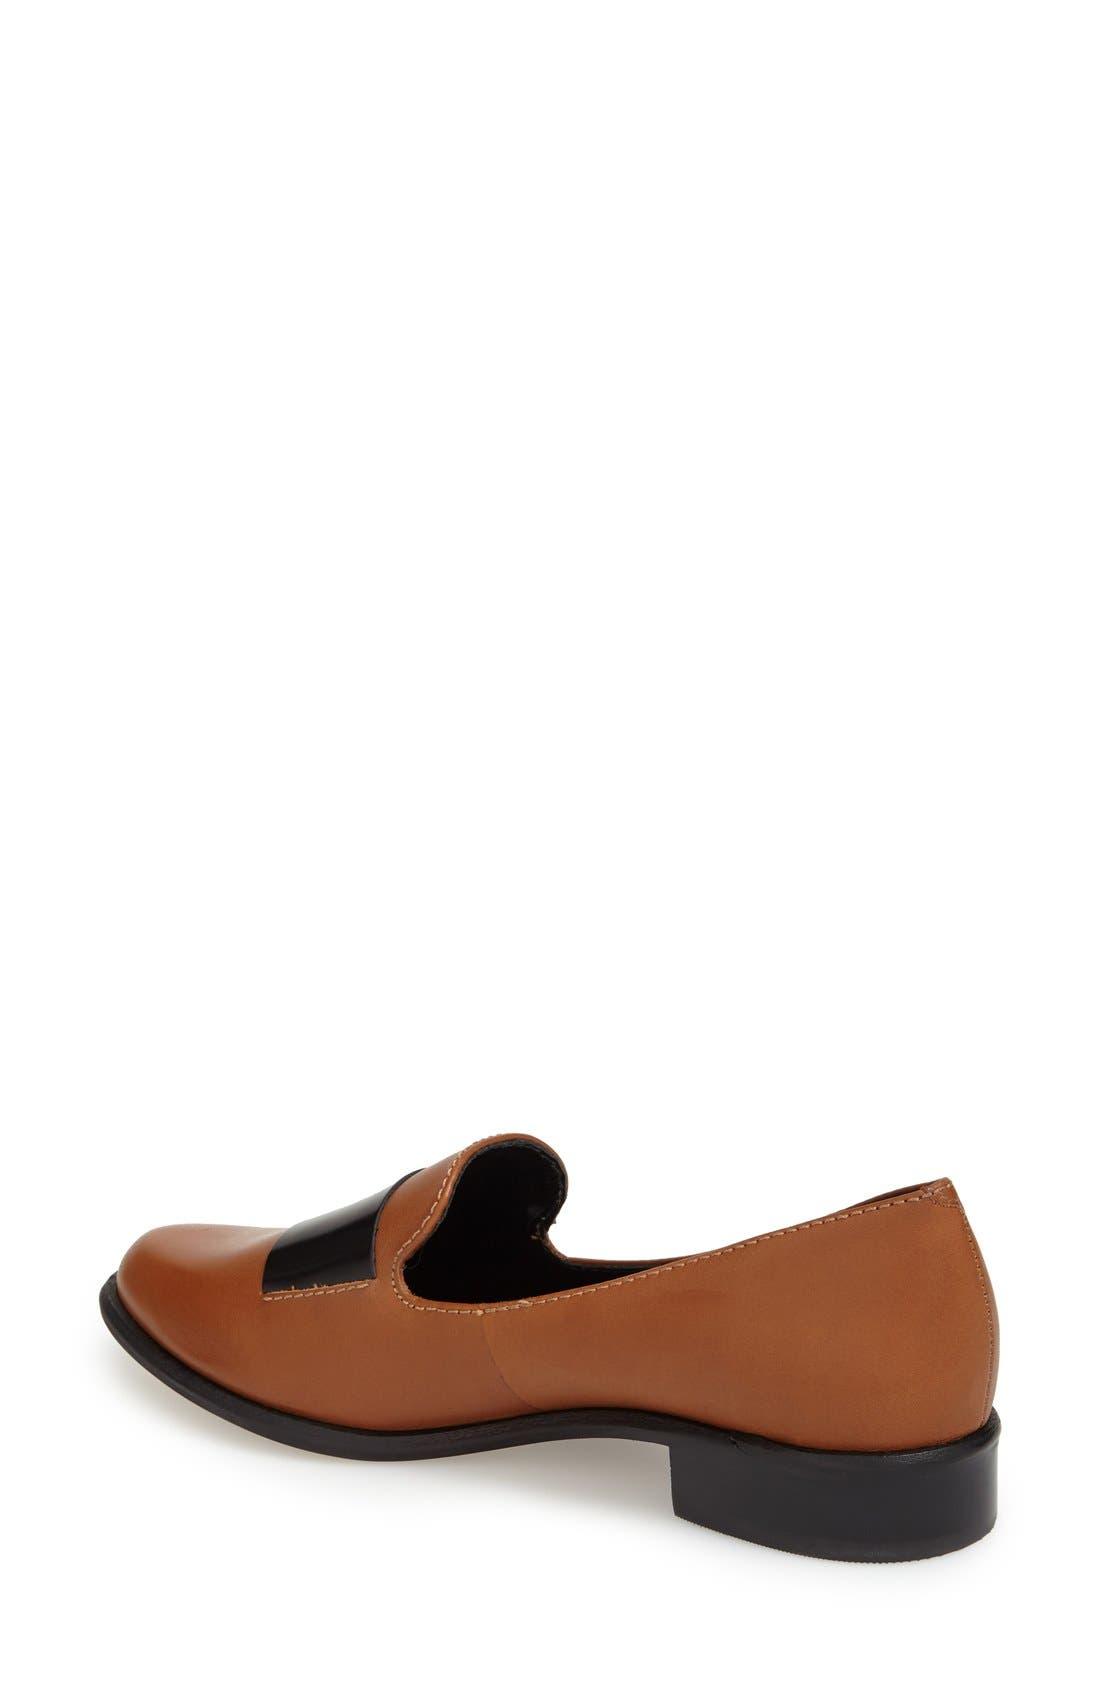 M4D3 'Ocean' Flat Loafer,                             Alternate thumbnail 11, color,